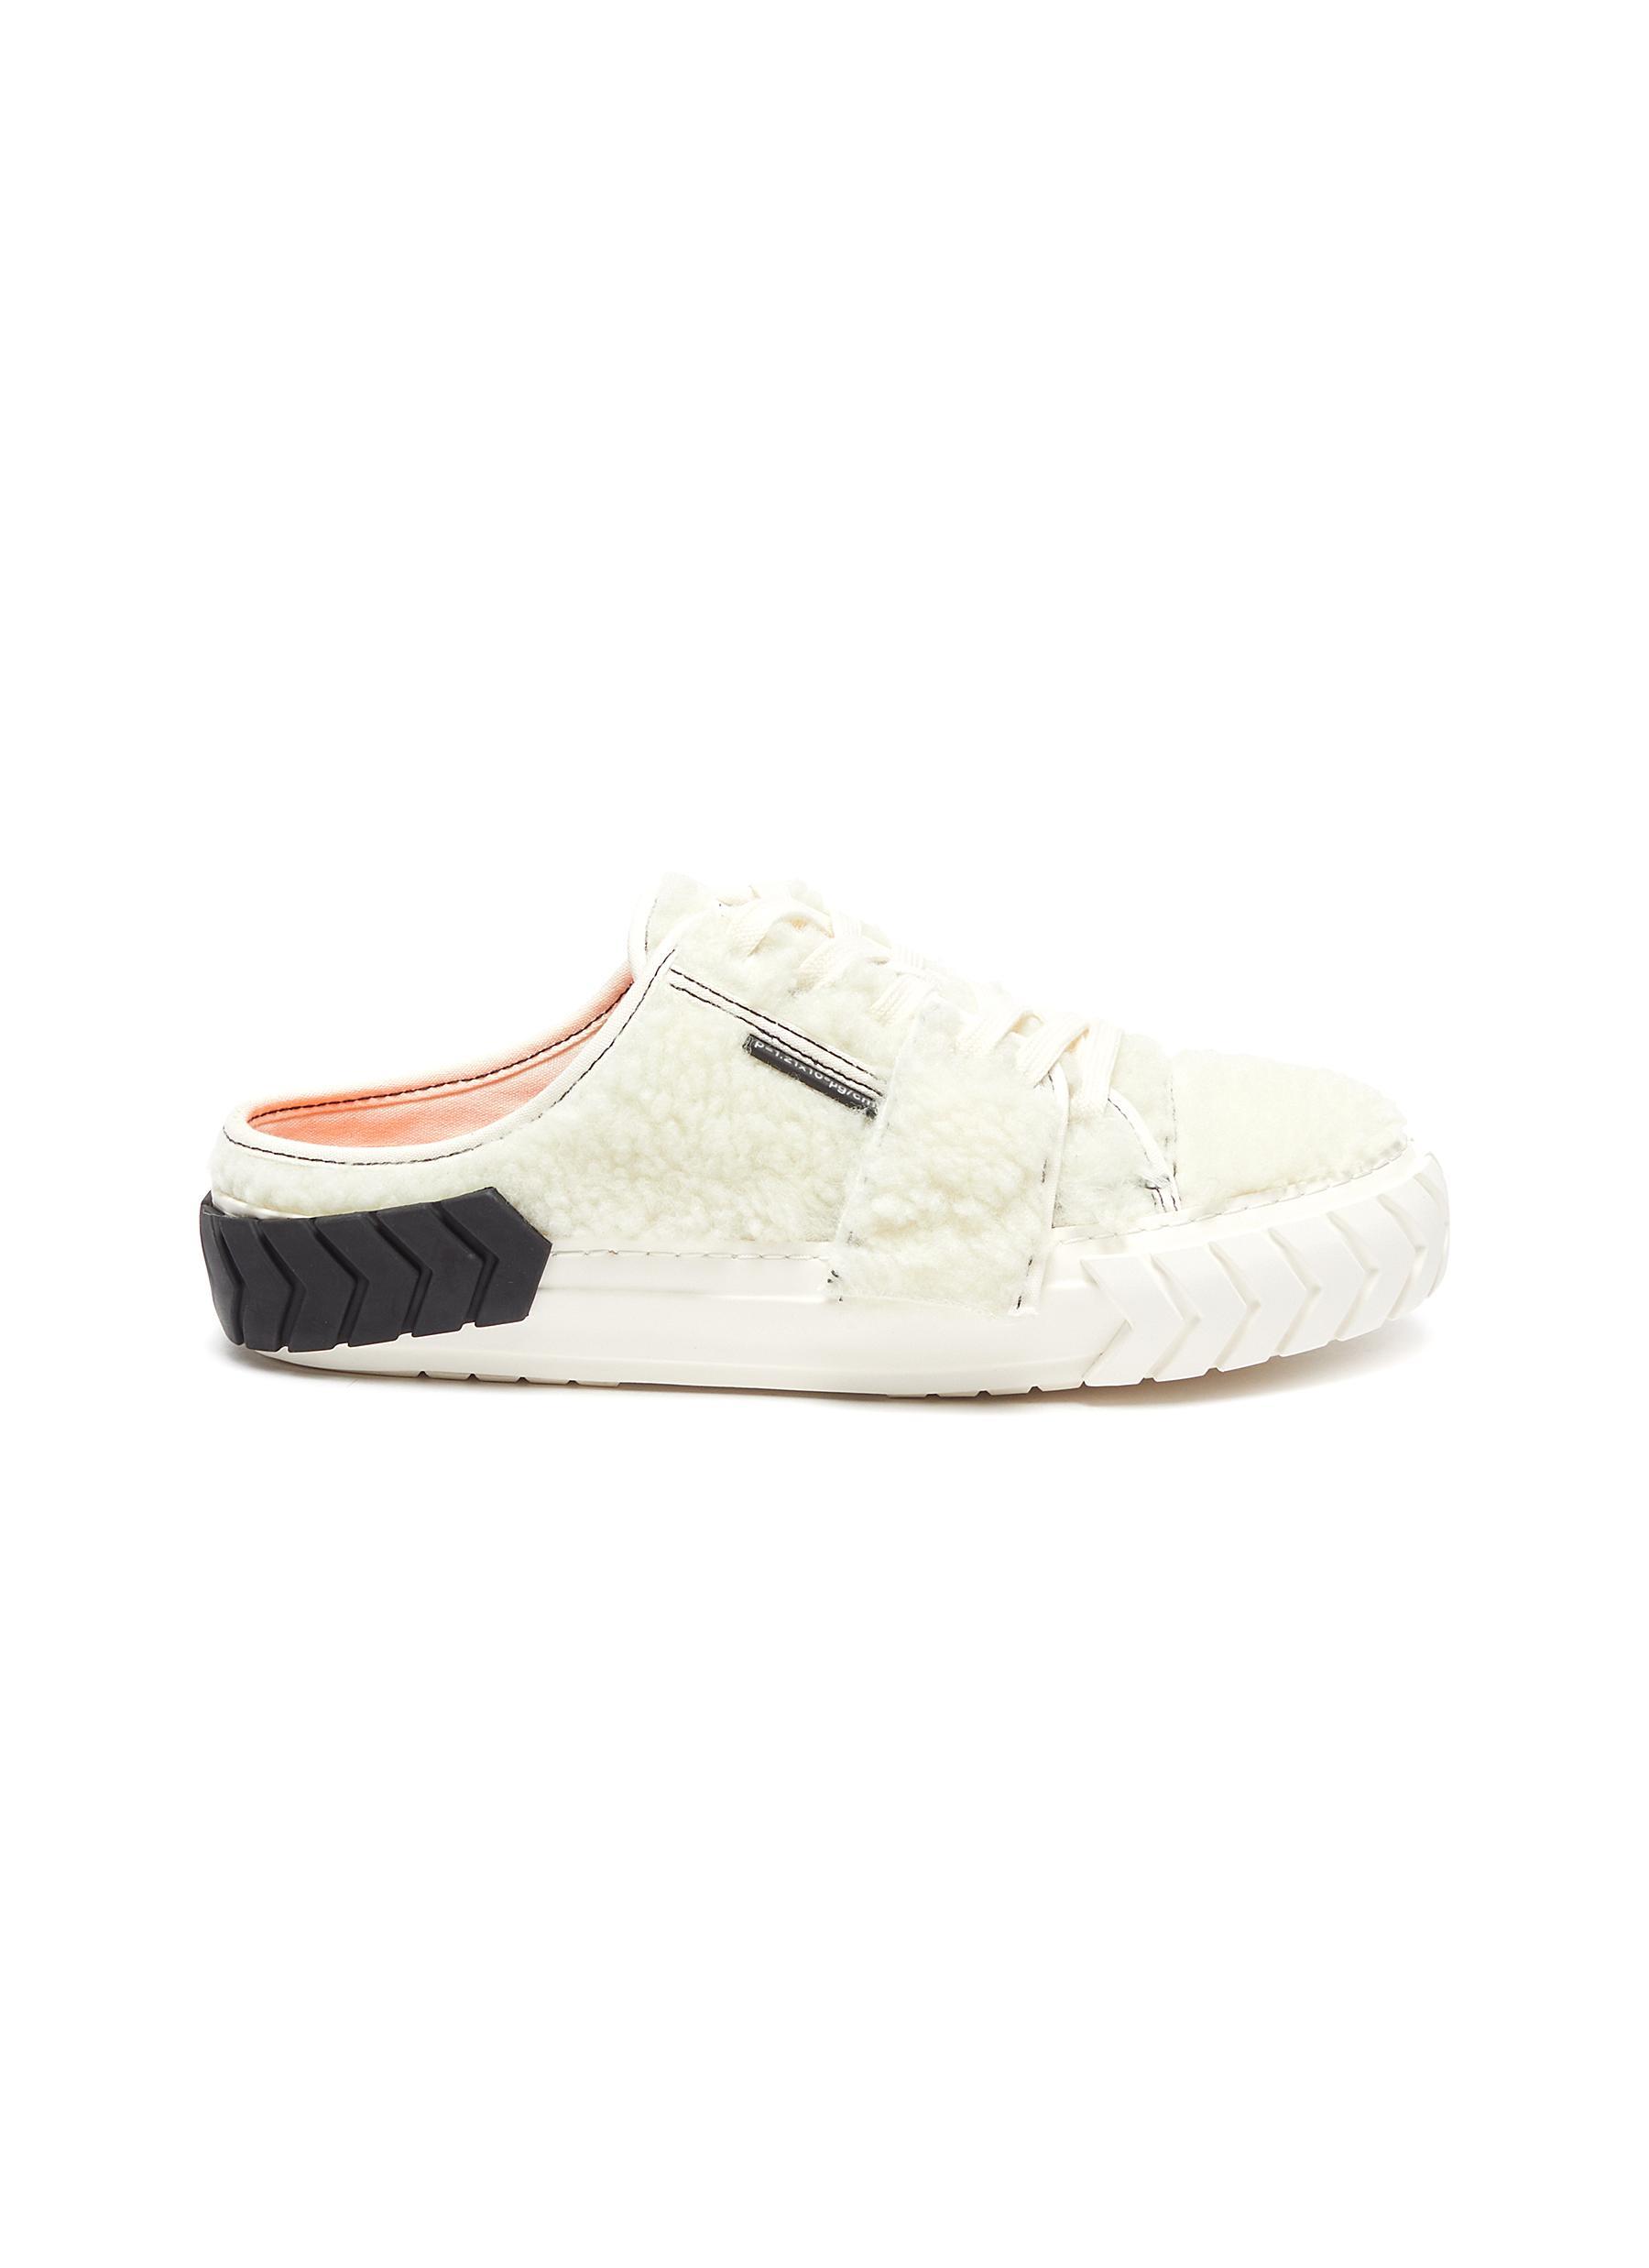 Tyres' Shearling Slip On Sneakers